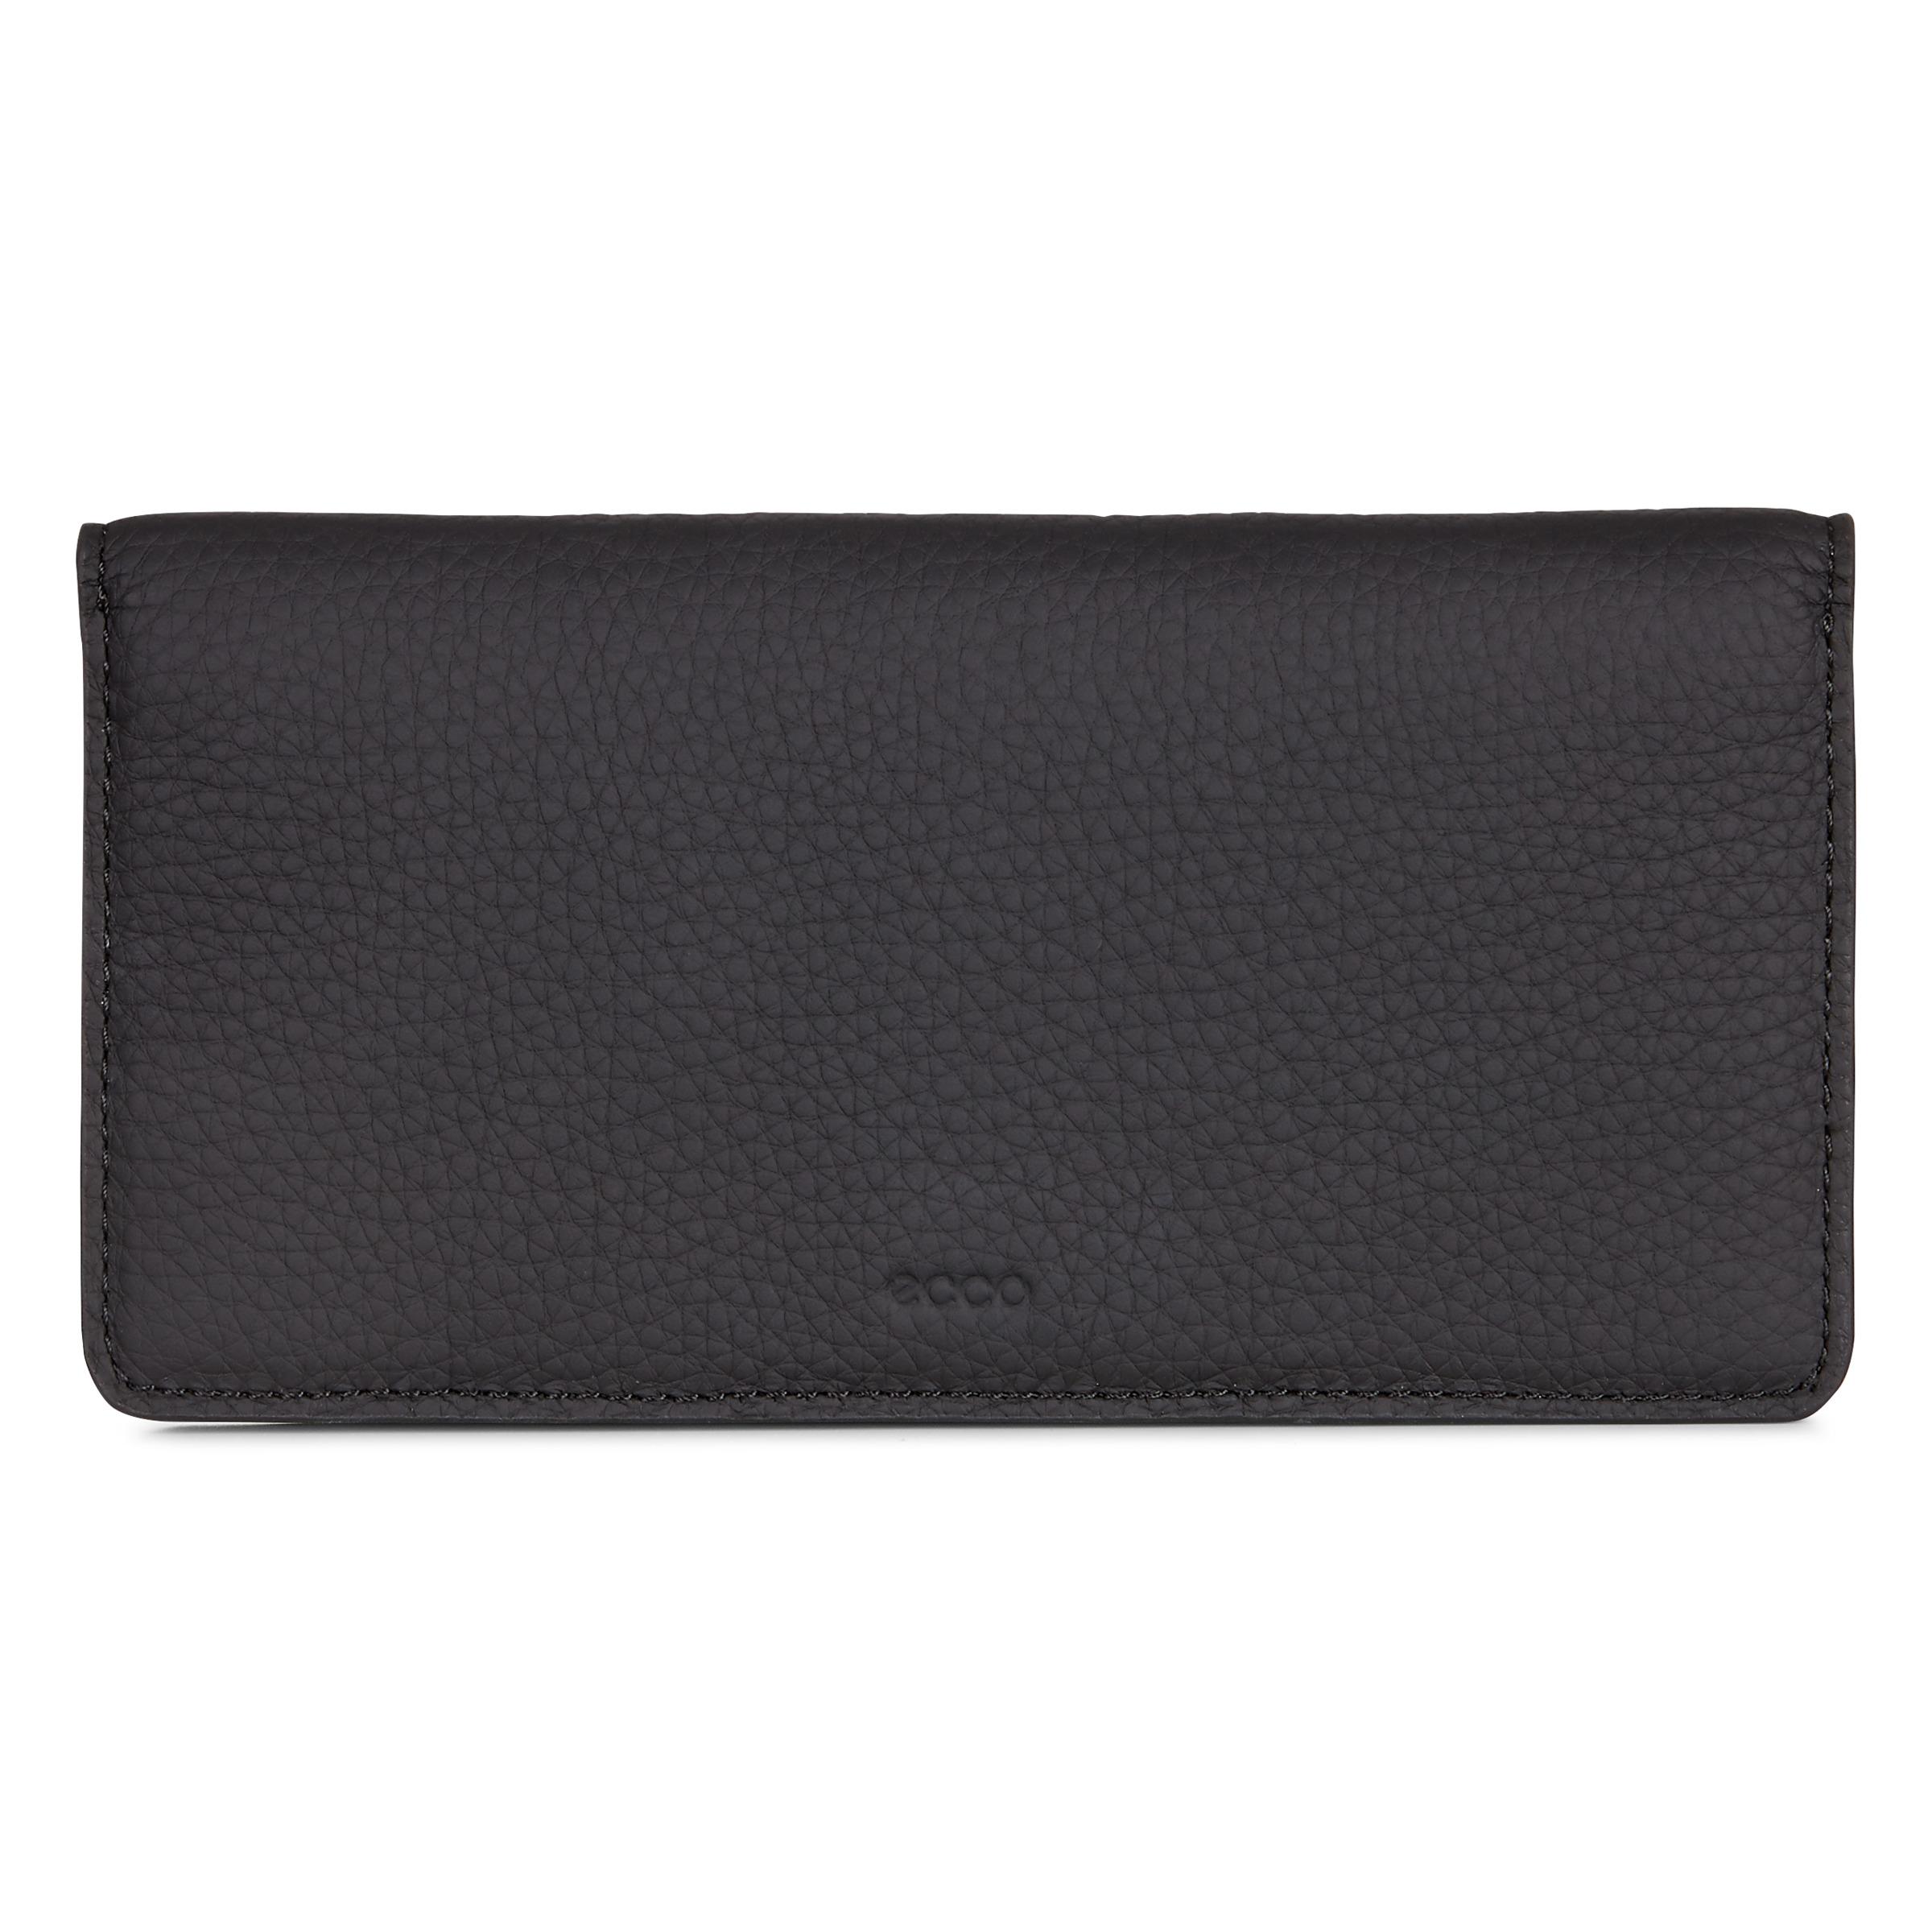 Image of ECCO Jilin Large Wallet